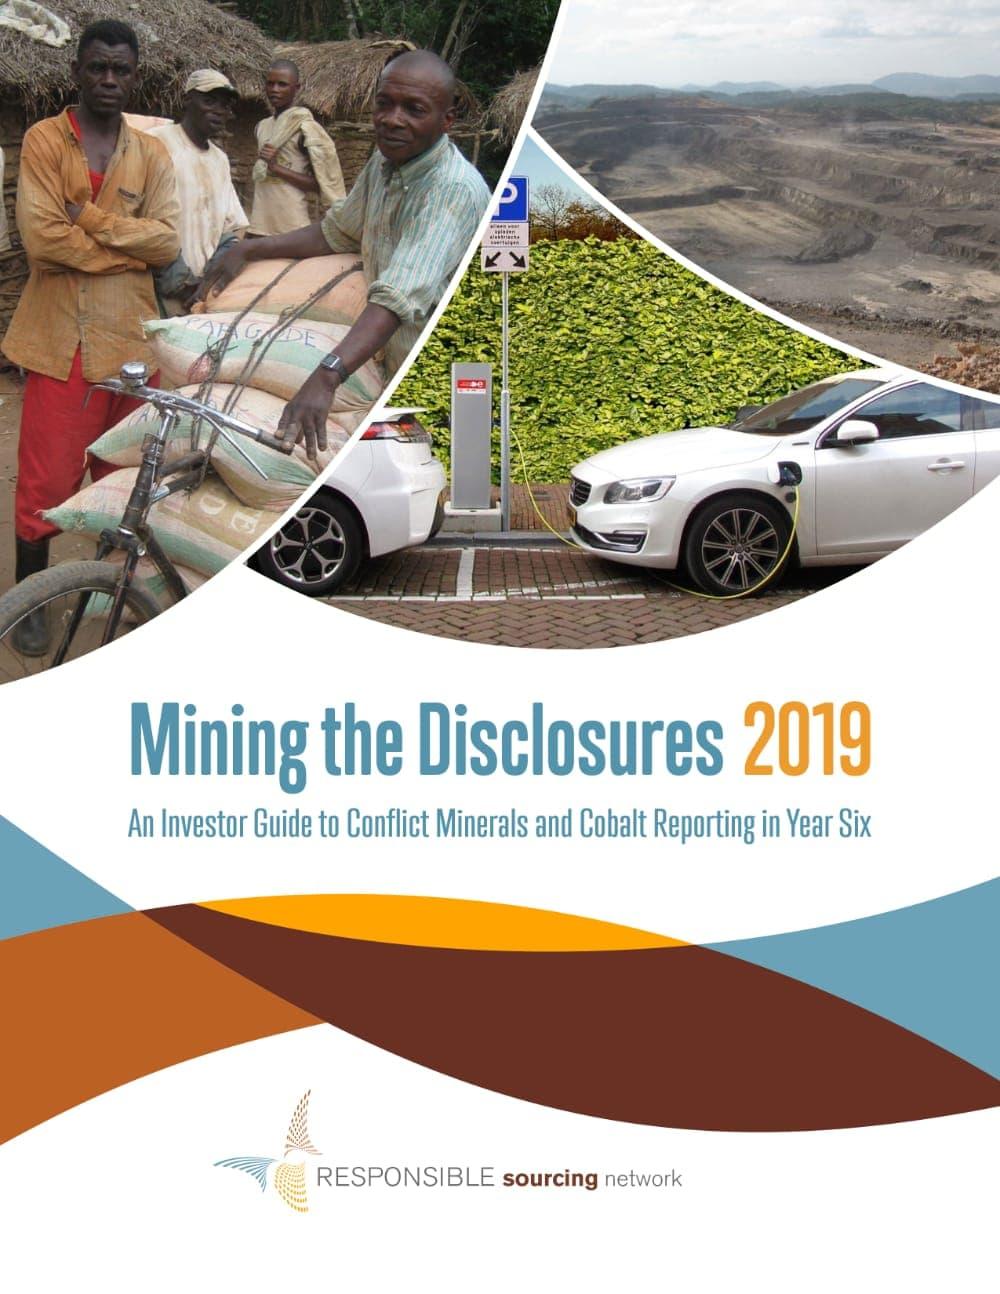 Mining the Disclosures 2019 Thumbnail.jpg